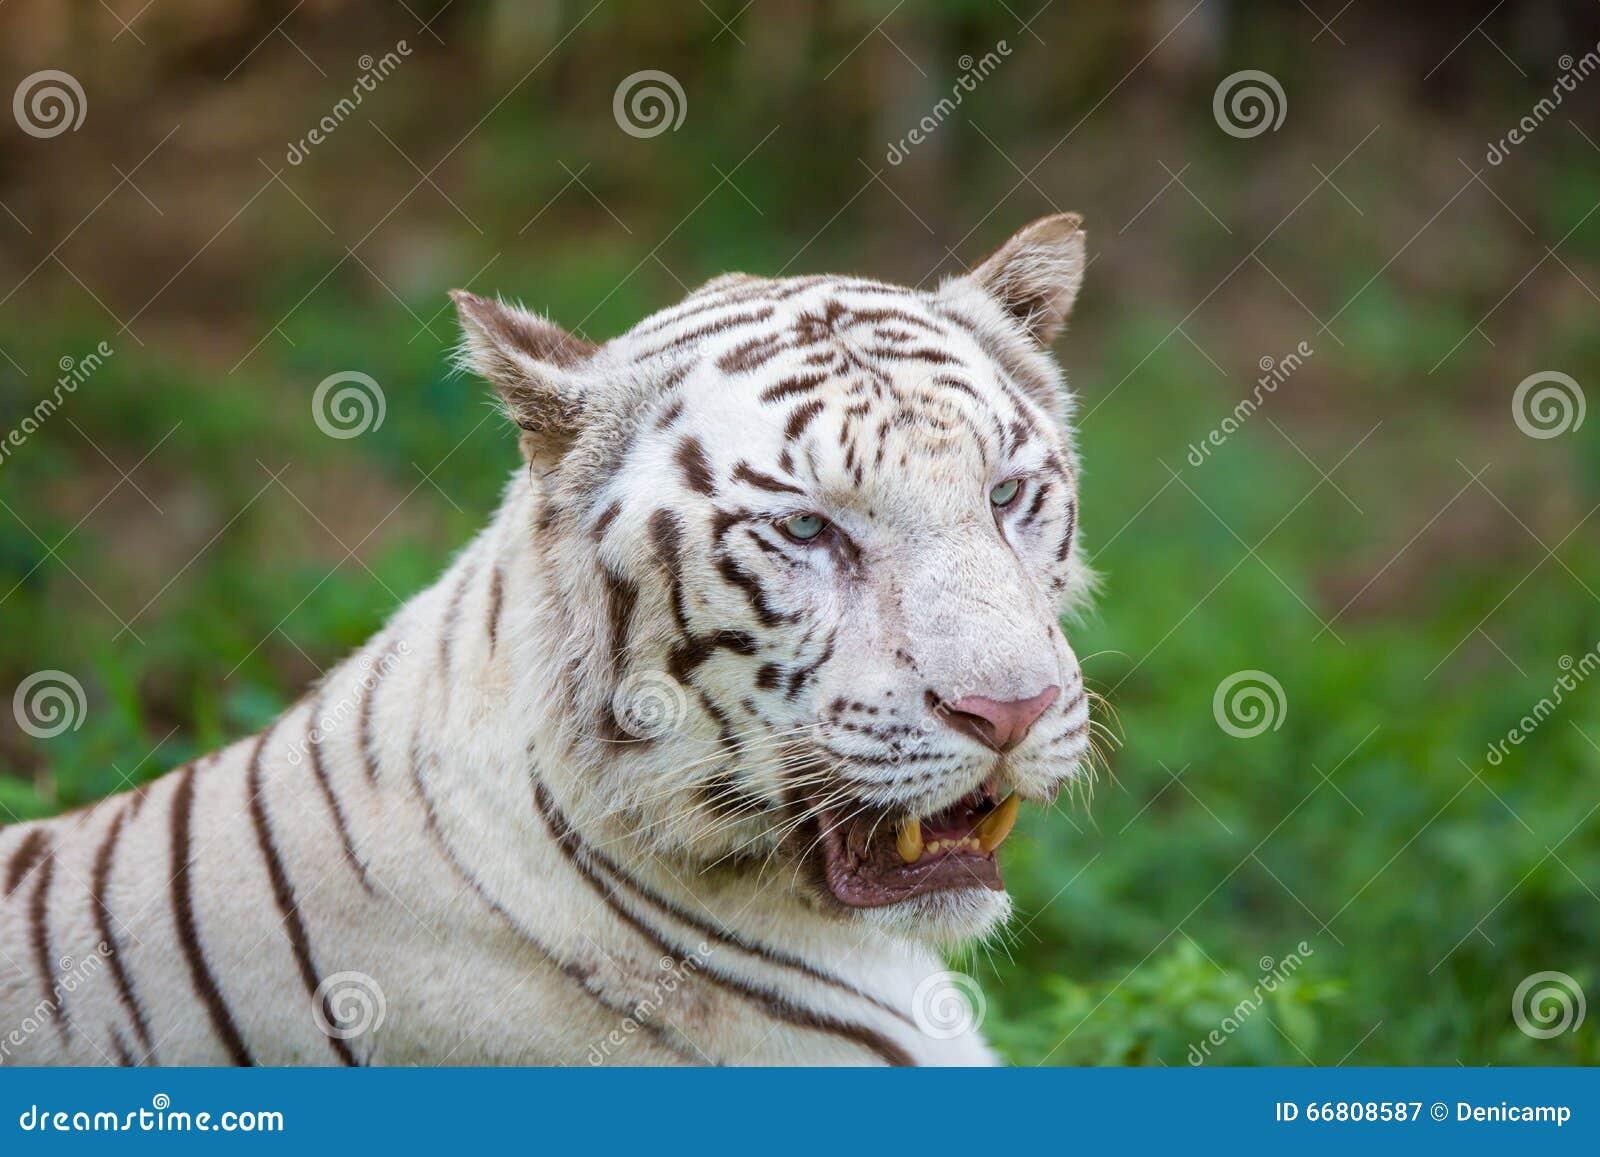 Rare White Tiger Roaming Wild  Stock Image - Image of